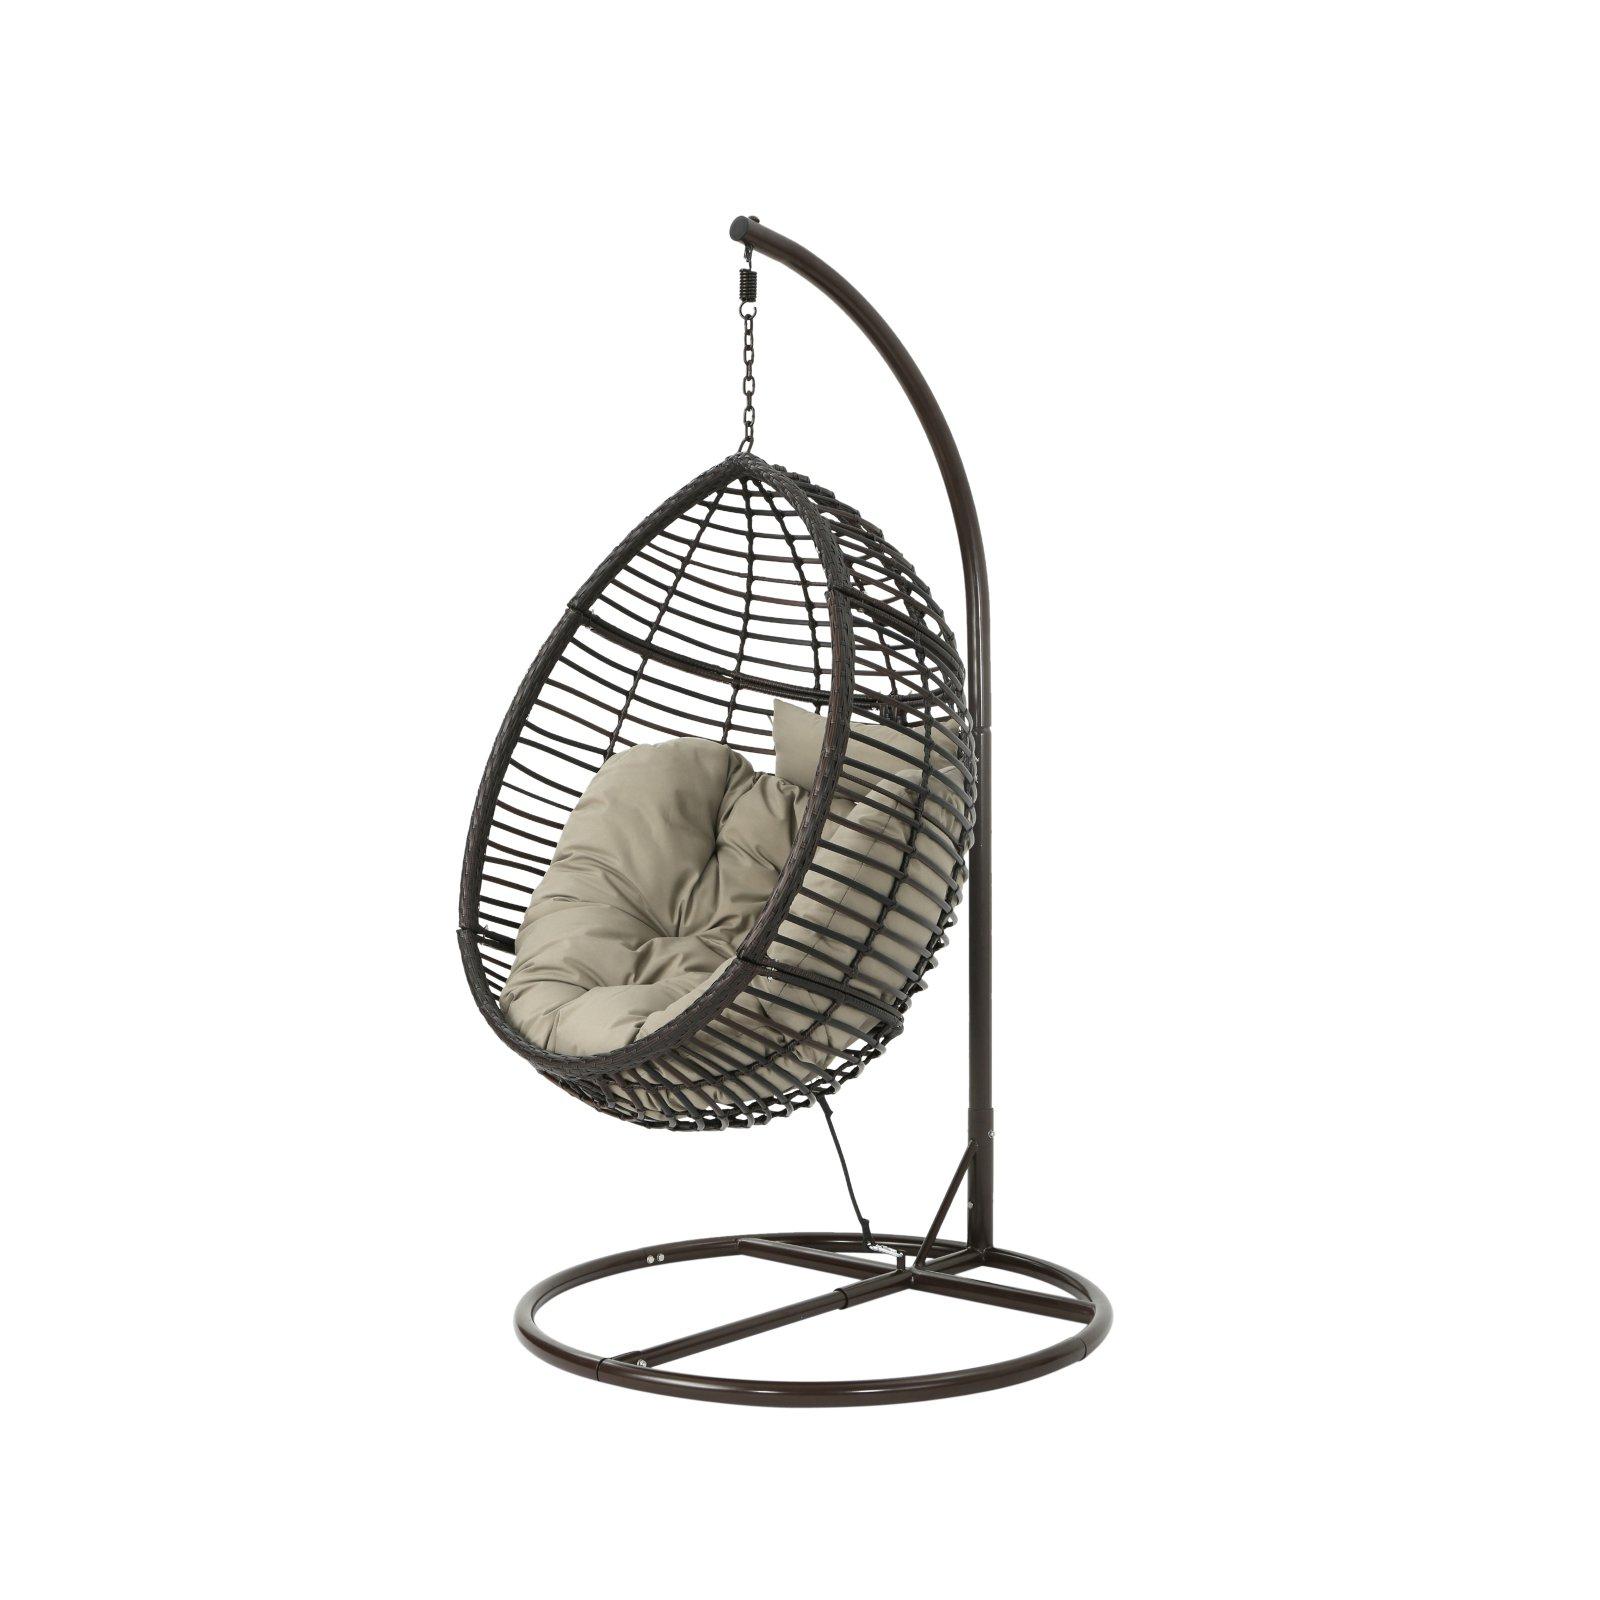 Hang Ei In Standaard.Best Selling Home Layla Wicker Outdoor Hanging Egg Chair Multibrown